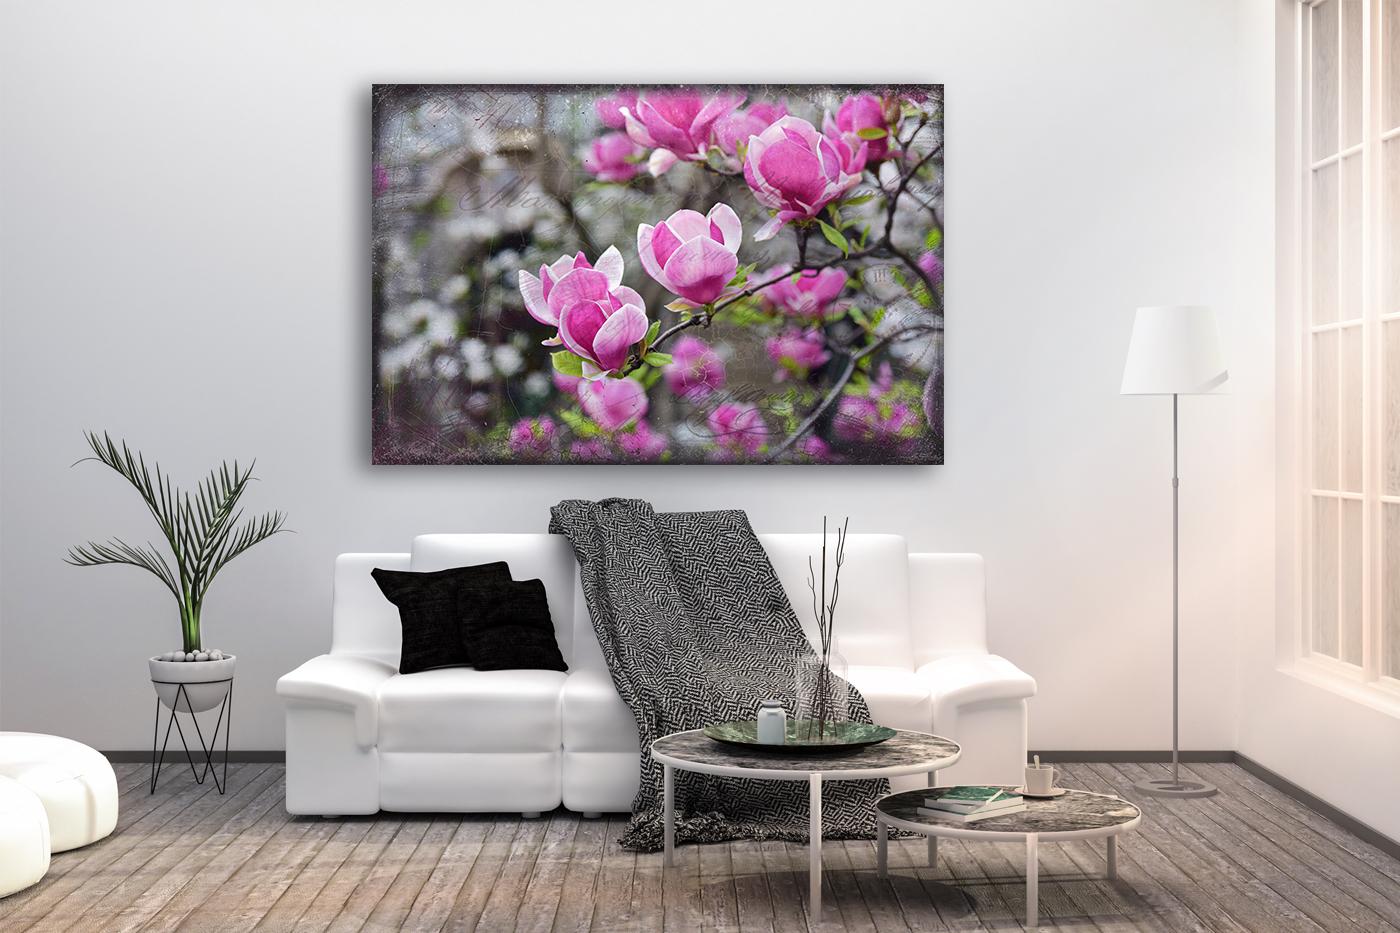 Nature photo, floral photo, spring photo, magnolia photo example image 3